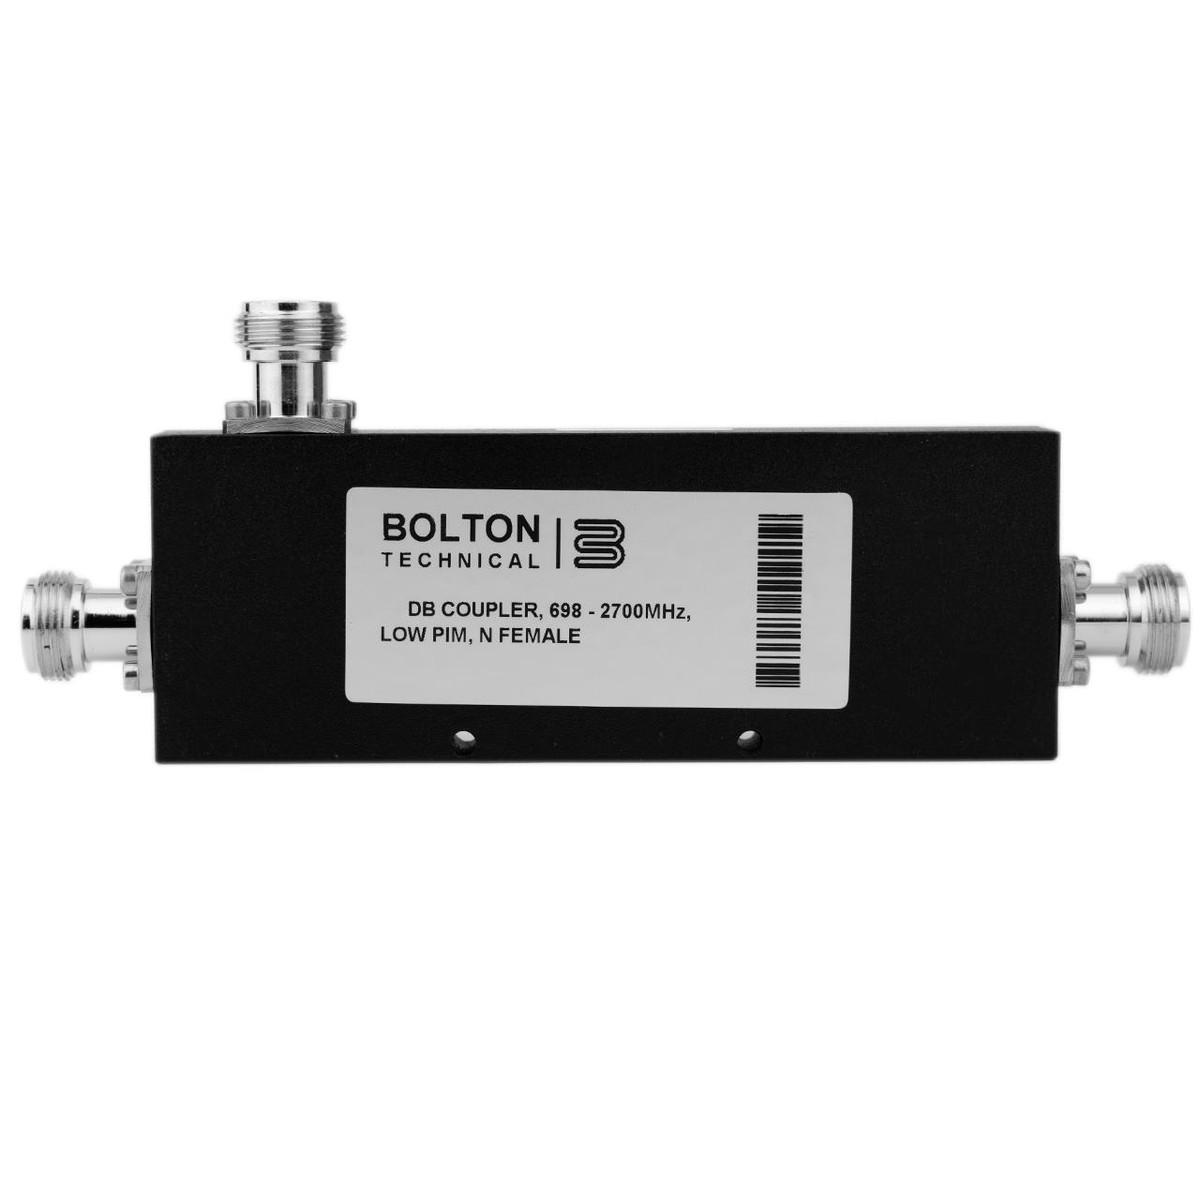 Bolton Tech Bolton Technical 15 dB Coupler, 698-2700 MHz, Low-PIM, N-Female